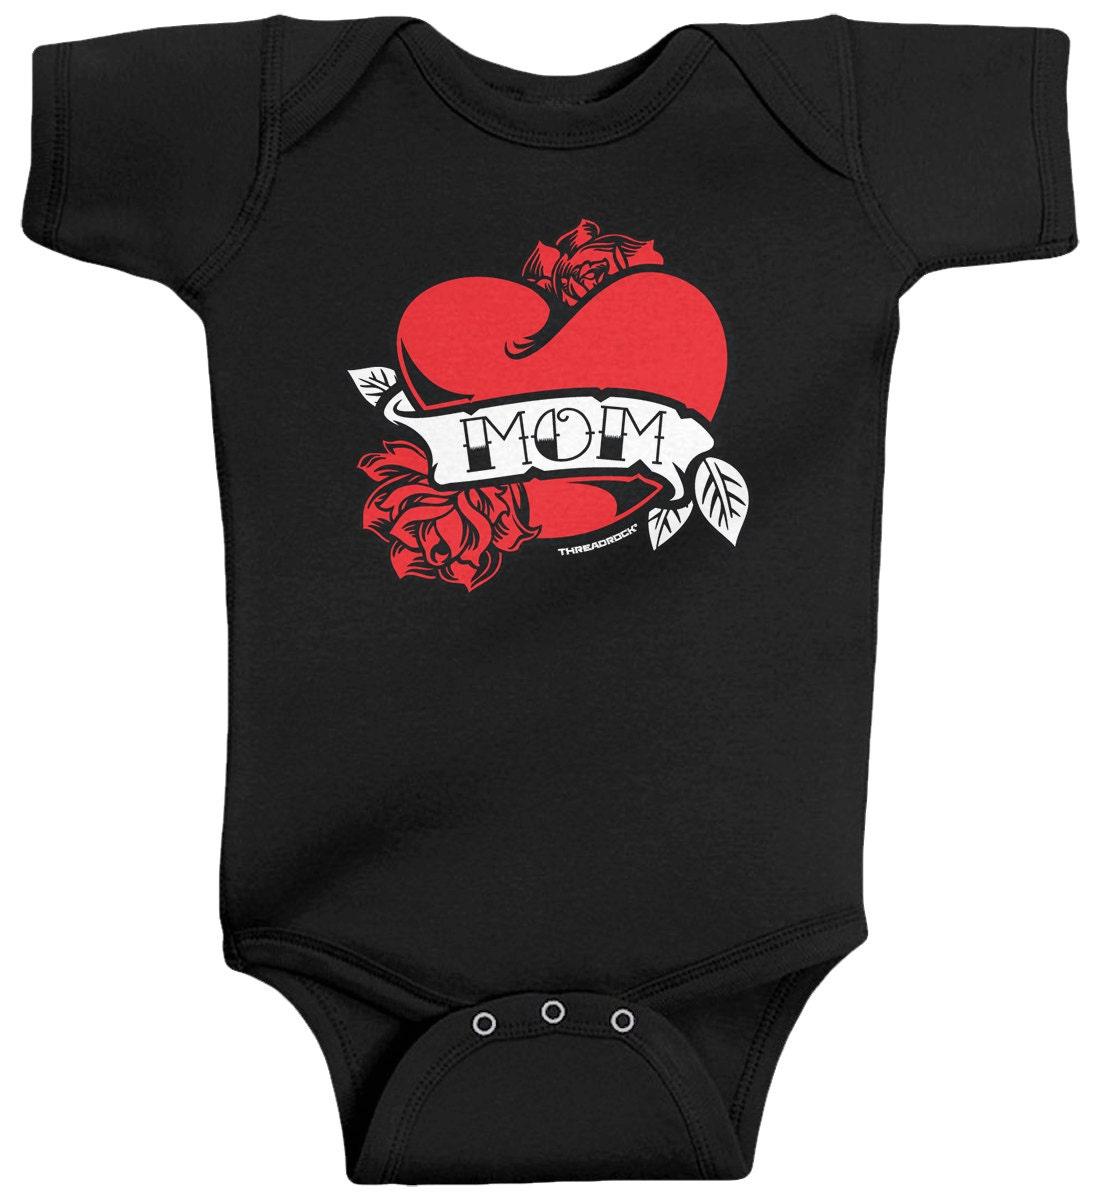 Mom Heart Tattoo Baby Boys  Infant Bodysuit c5b5a5014